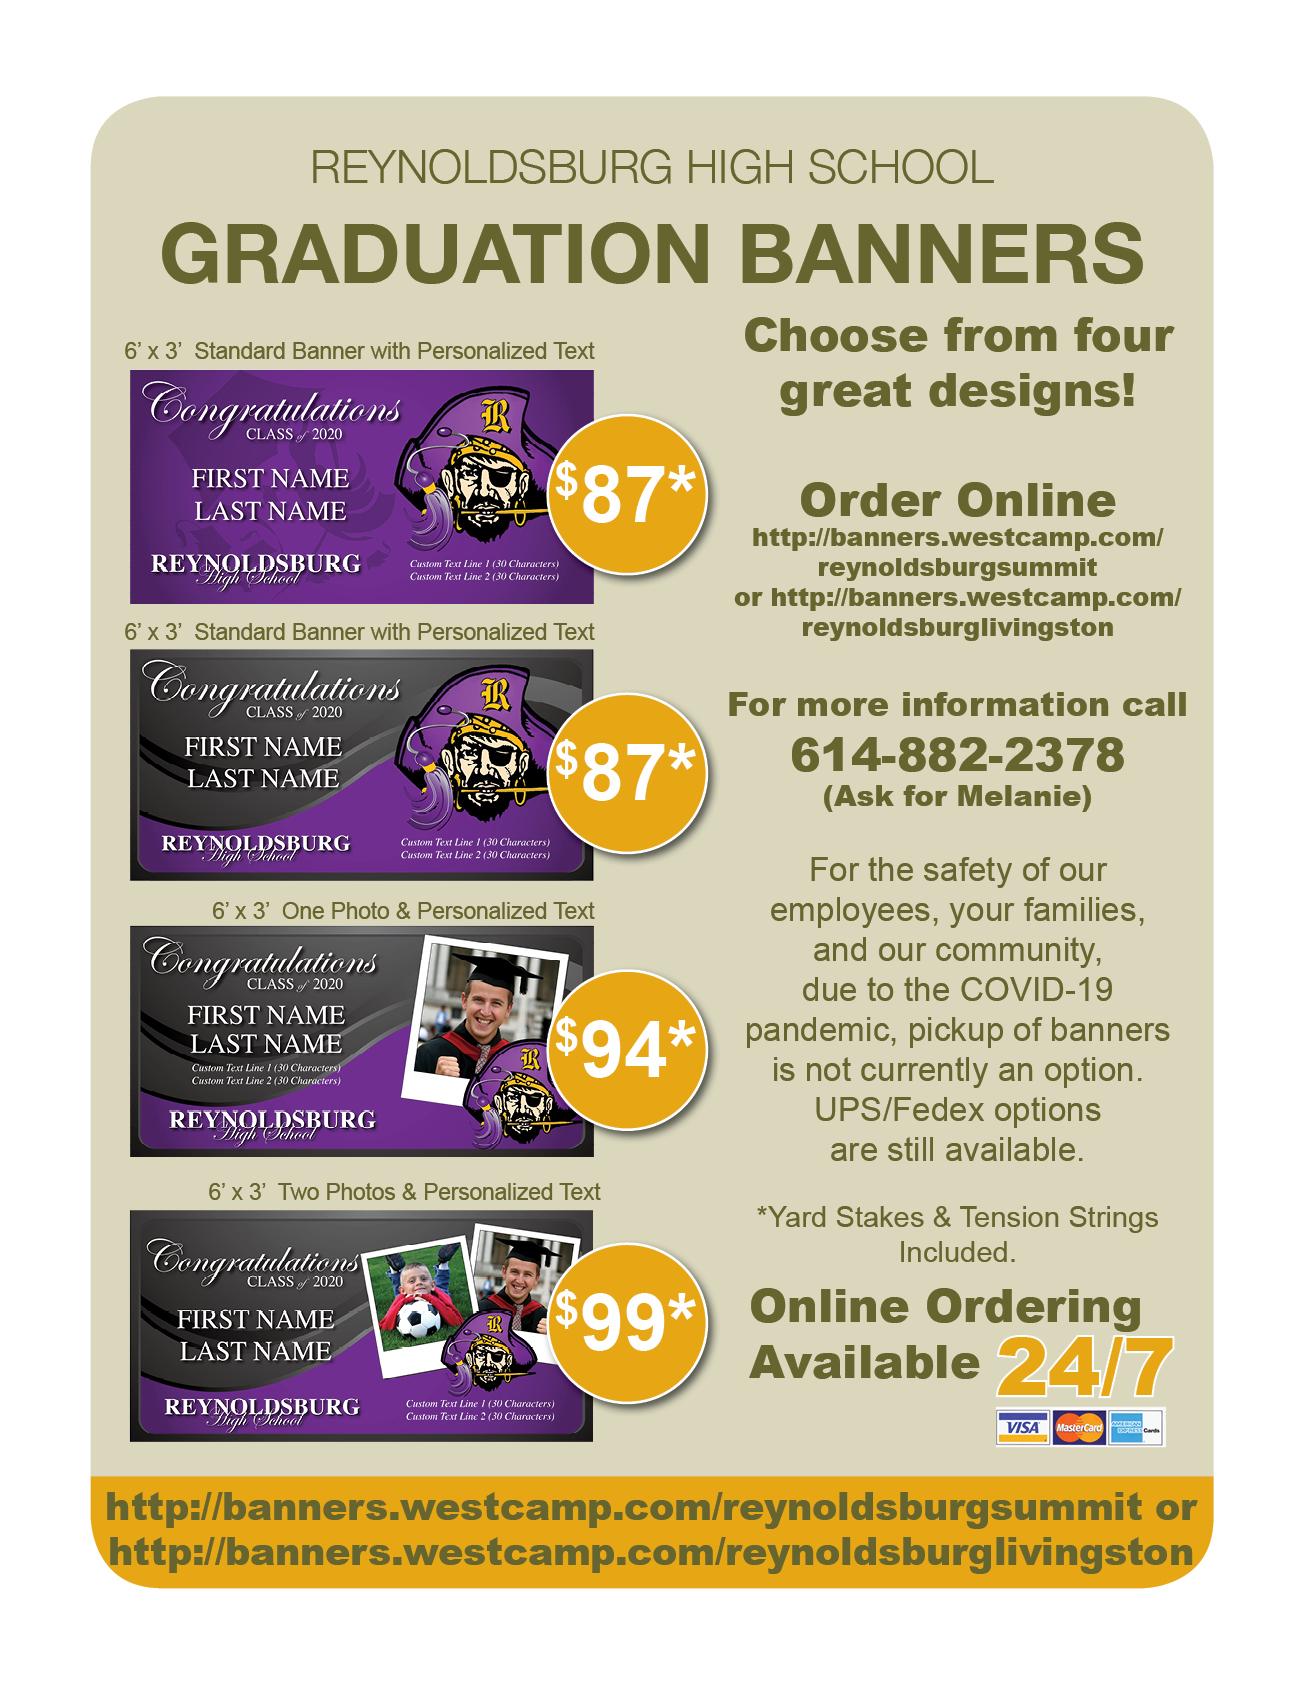 Senior Banner information